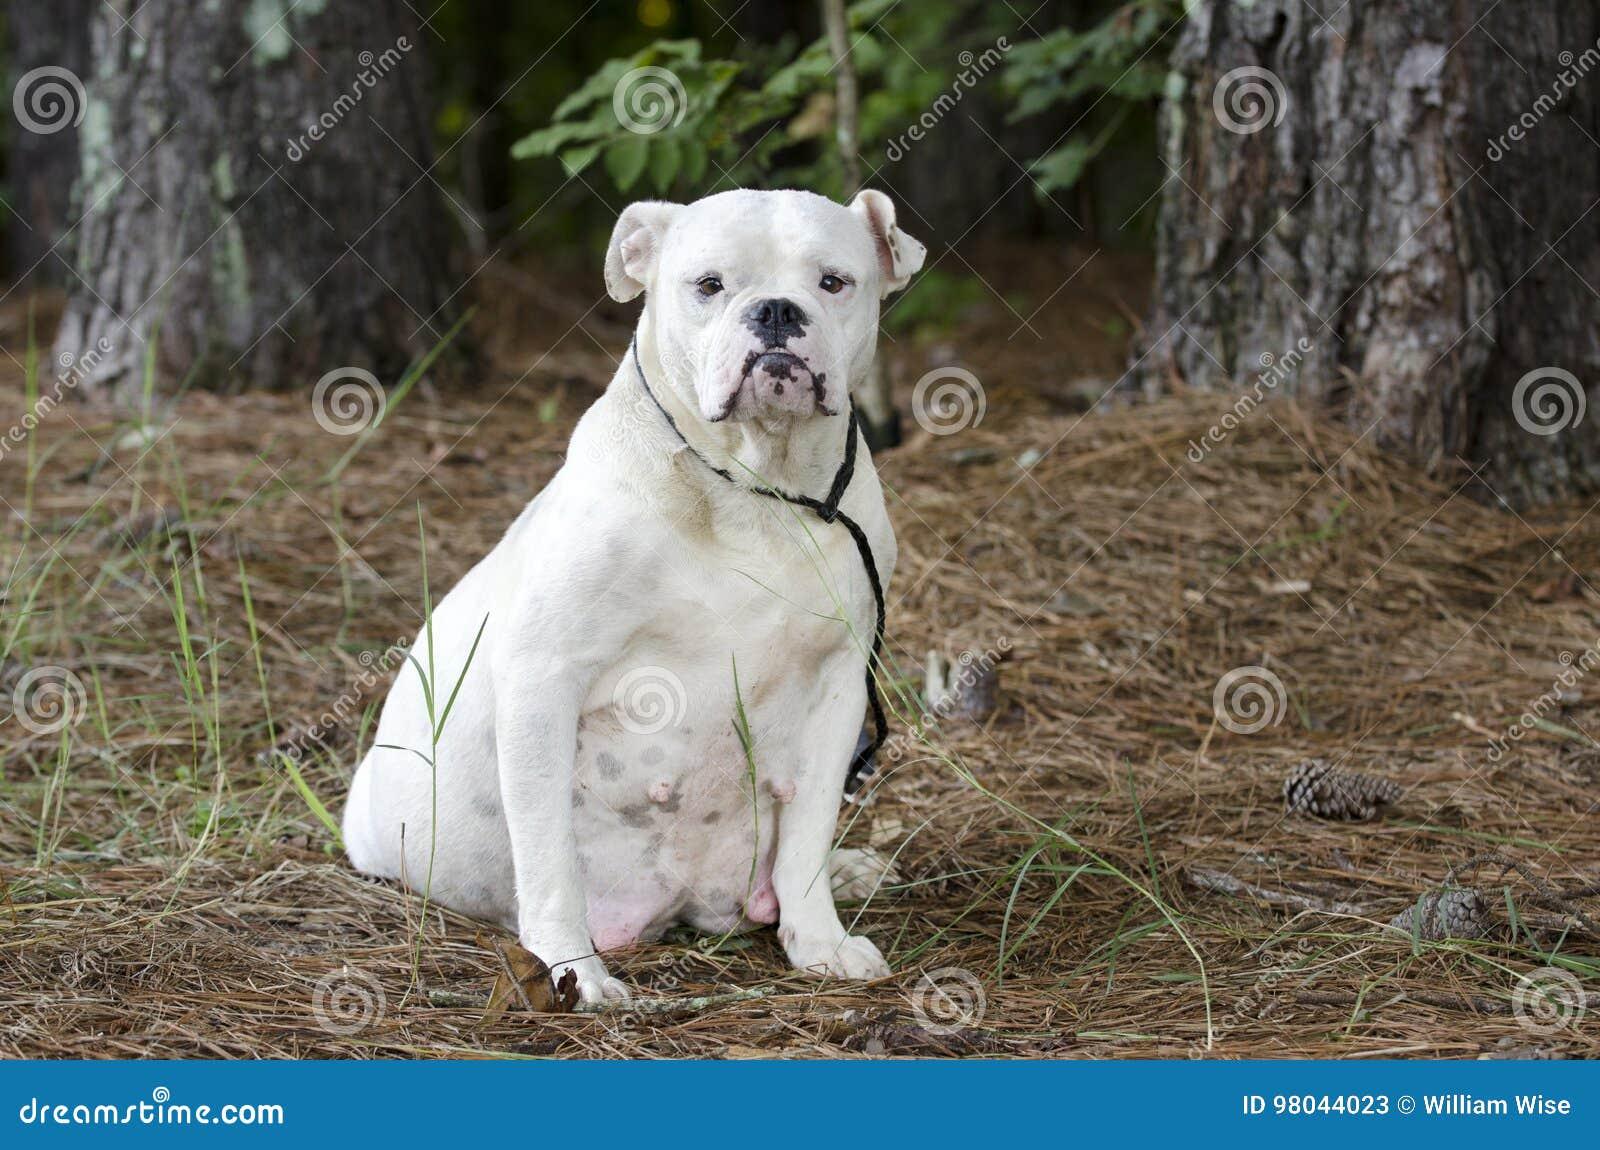 Pregnant English Bulldog Dog Stock Image Image Of Bulldog Puppies